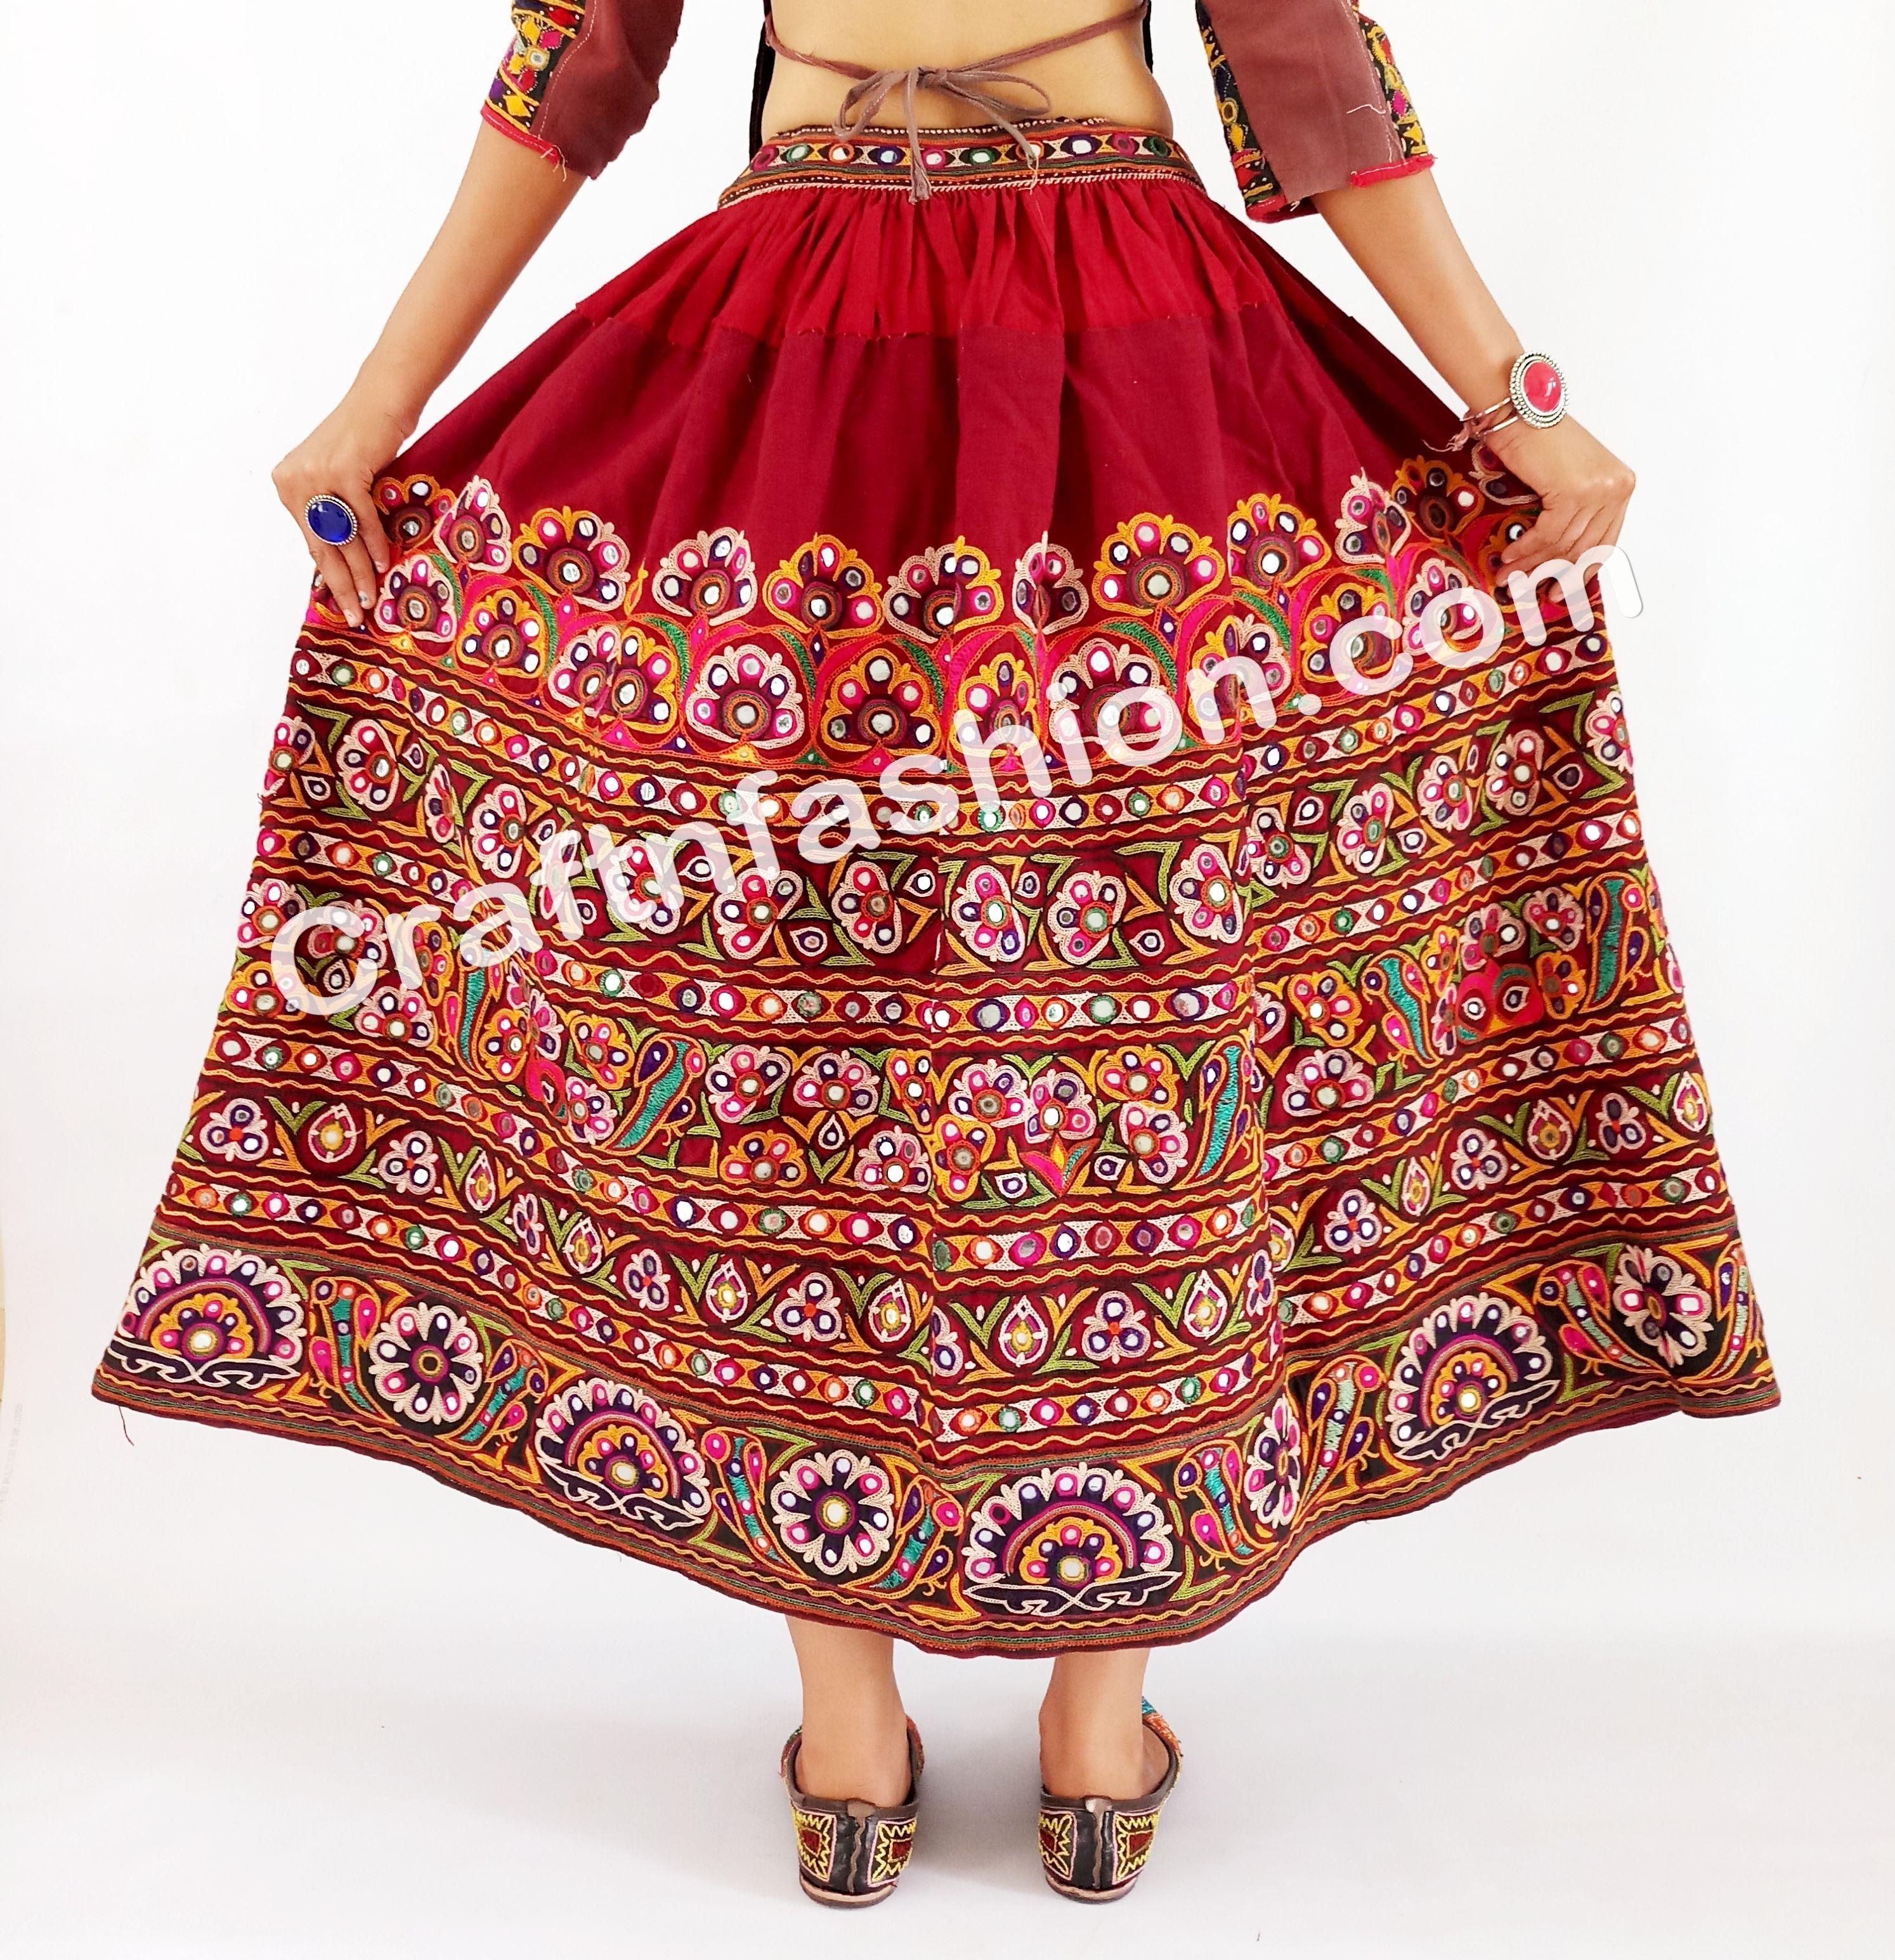 a750c7e28c Rajasthani Readymade kutchi Rabari skirt- Hand Embroidered Rabari Girl's  skirts